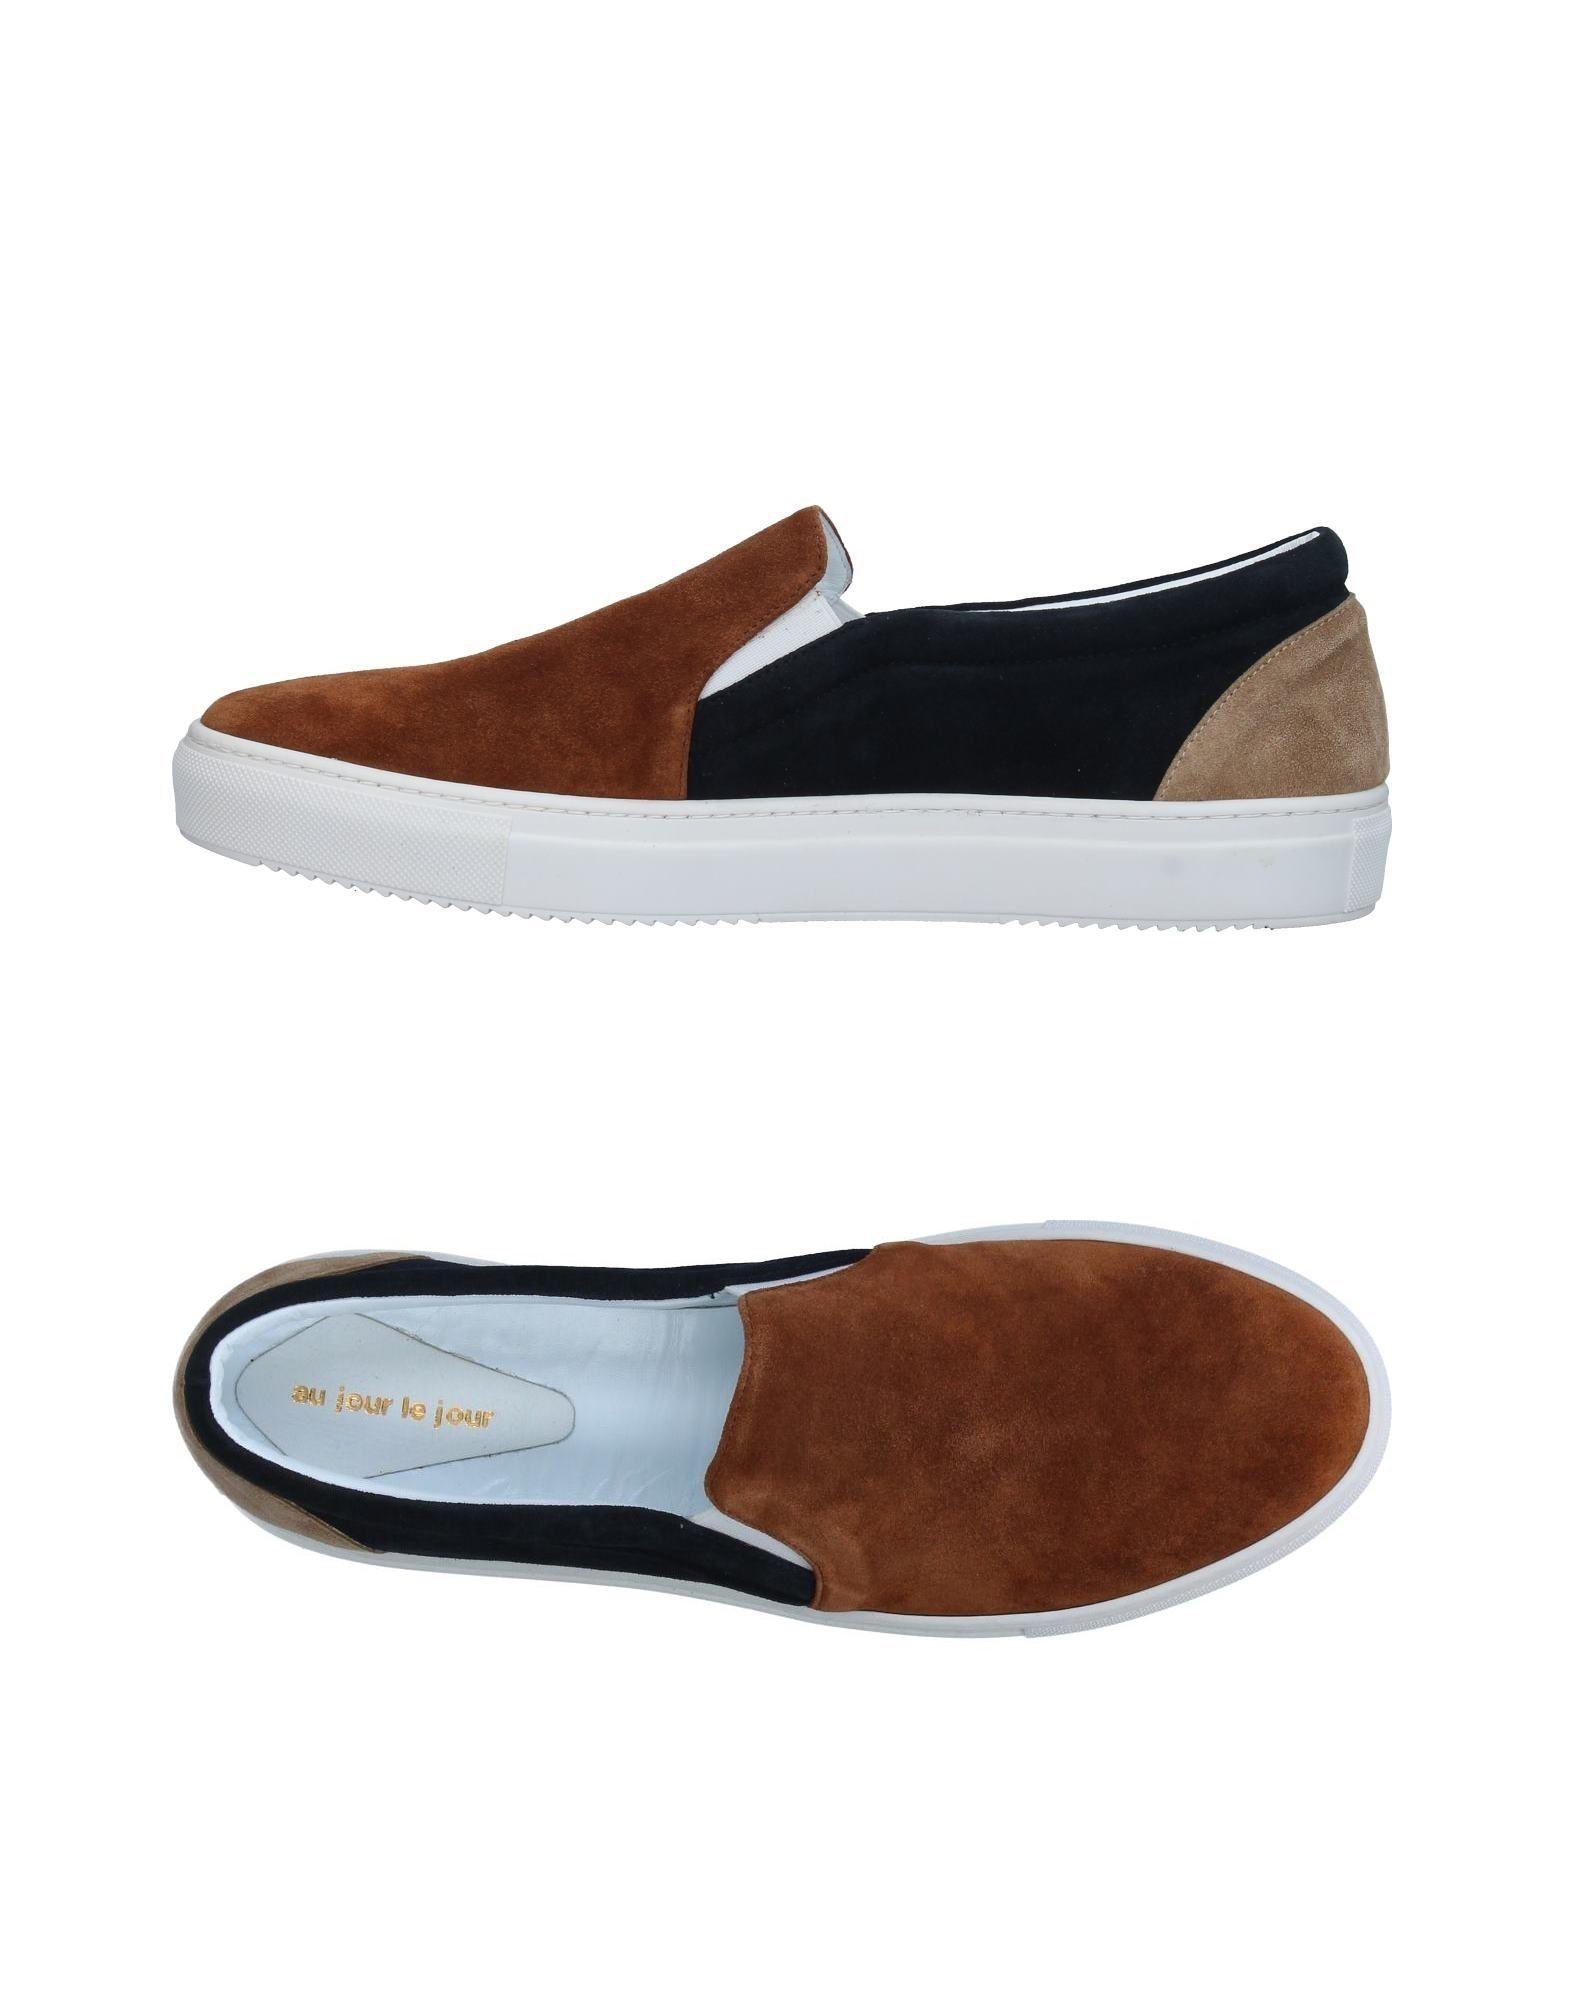 Sneakers Uomo Au Jour Le Jour Uomo Sneakers - 11331054RN 4f3711